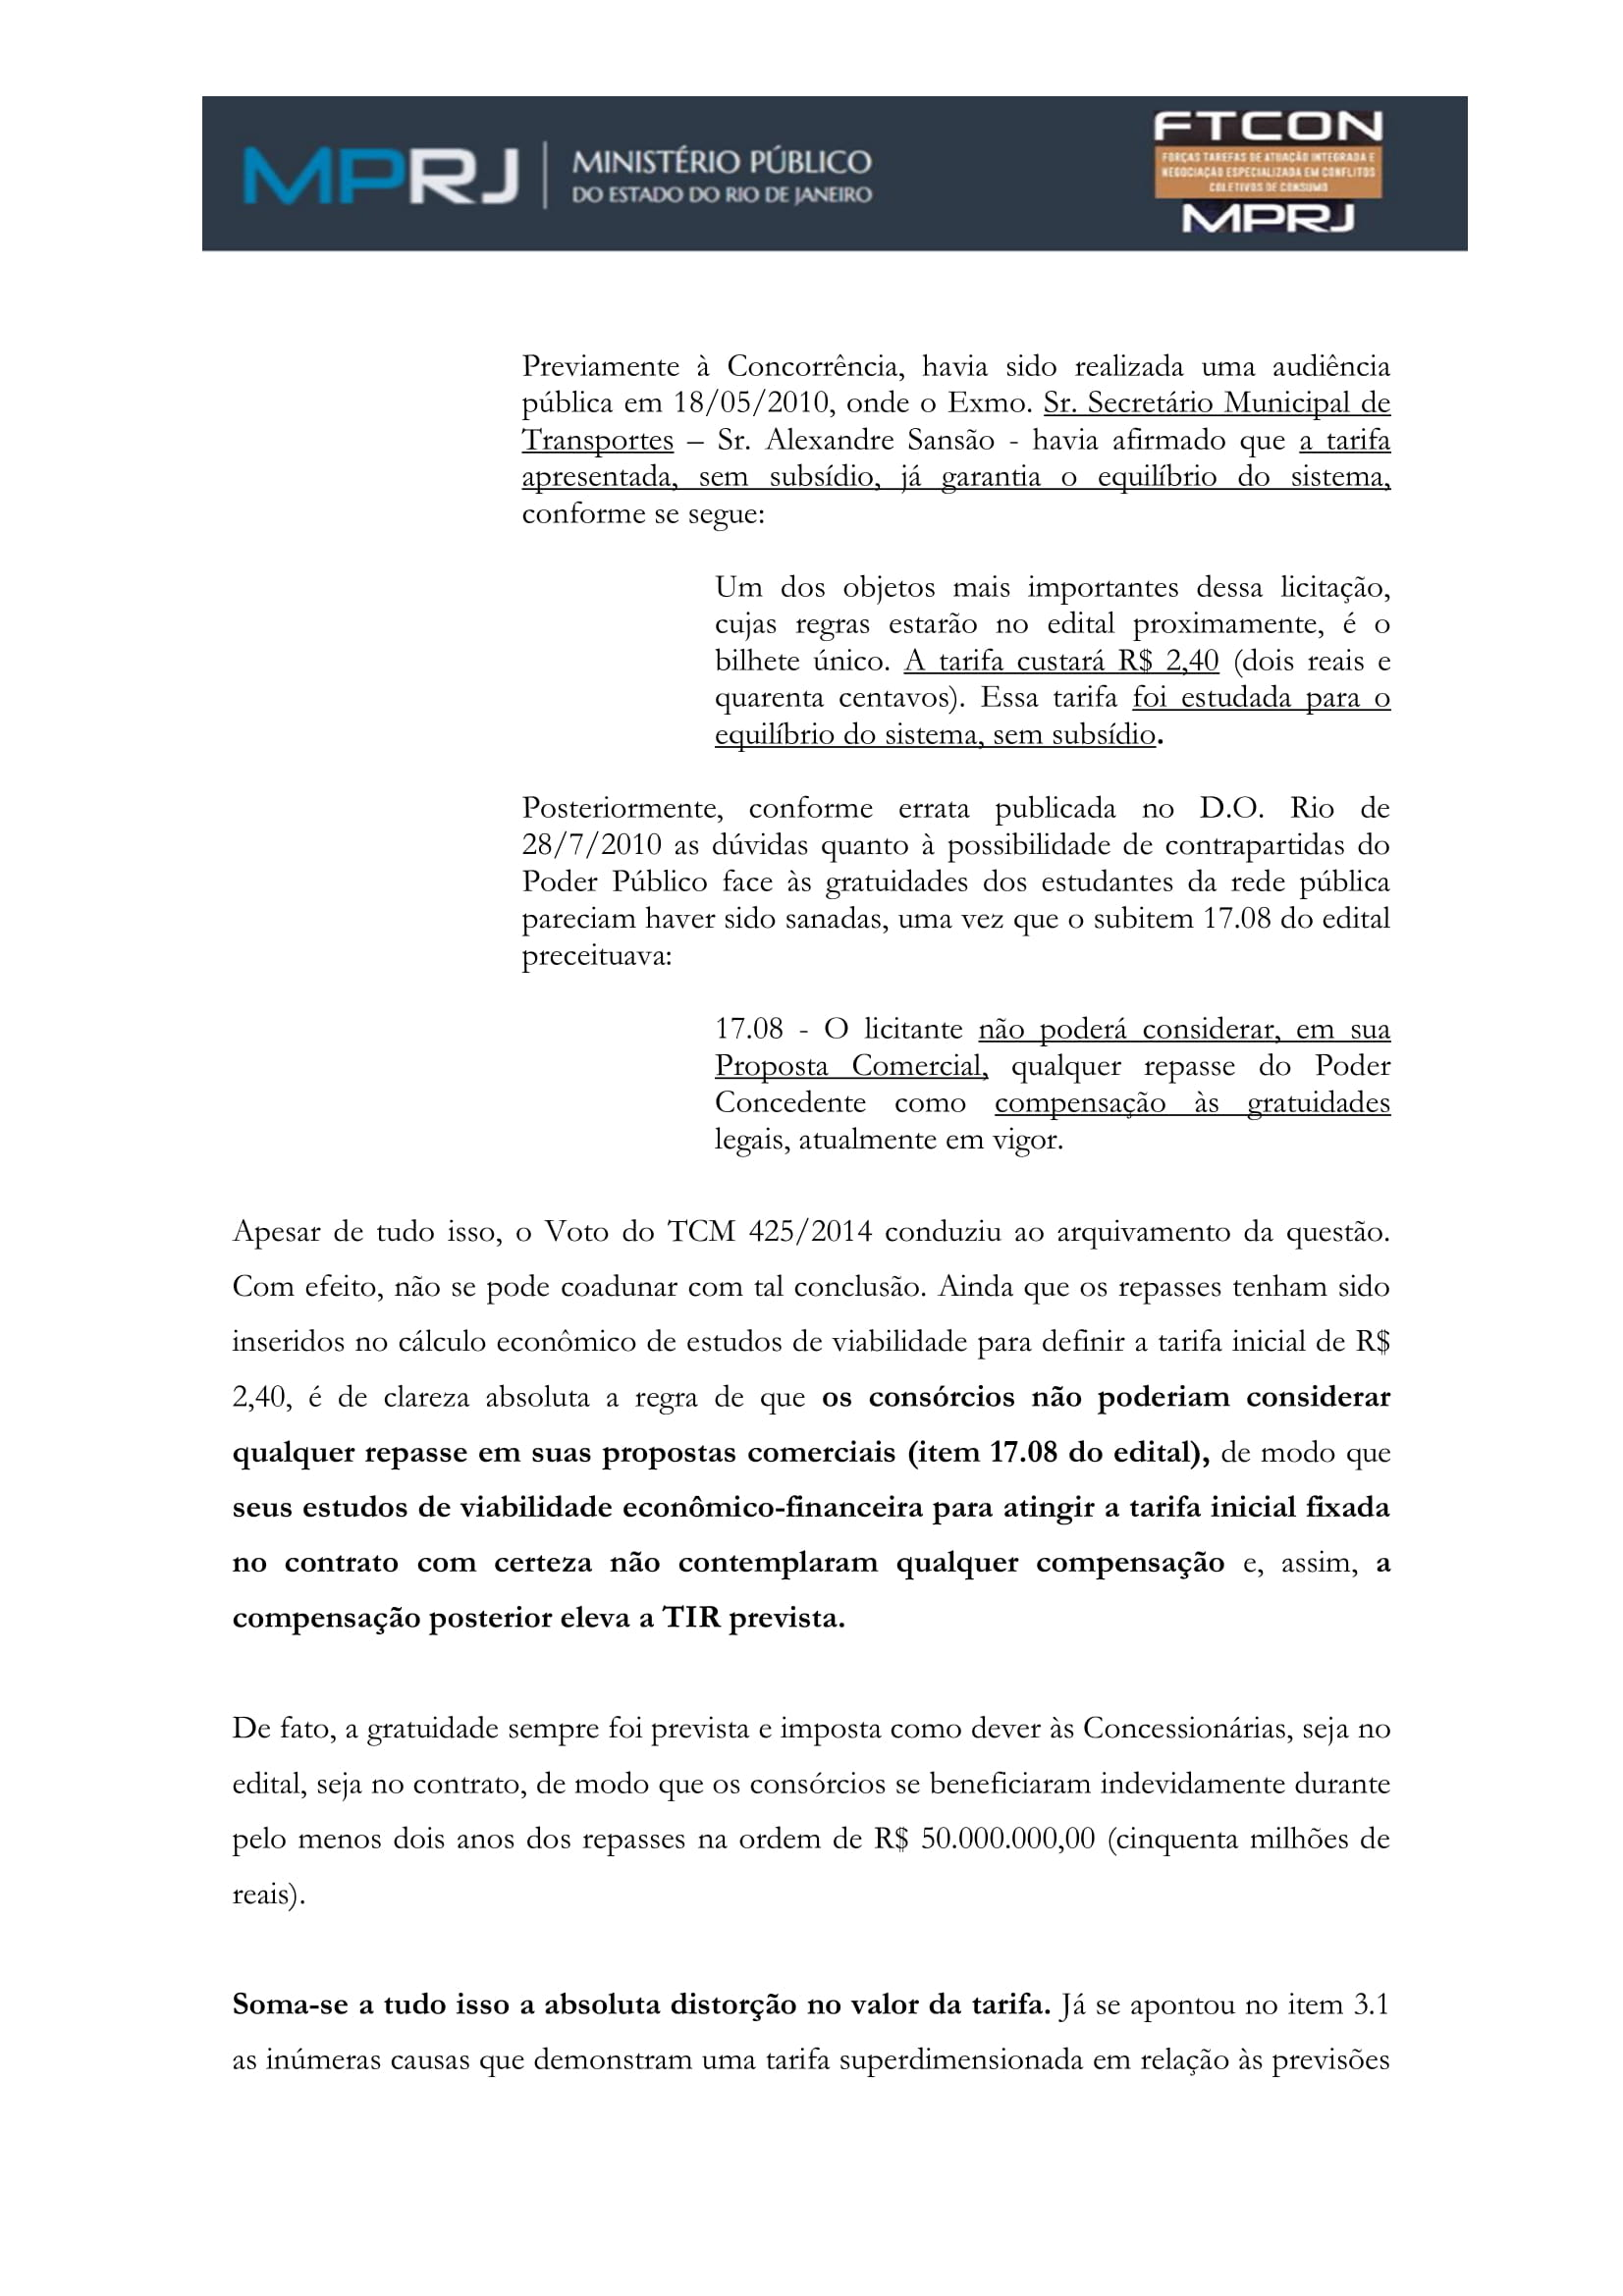 acp_caducidade_onibus_dr_rt-096